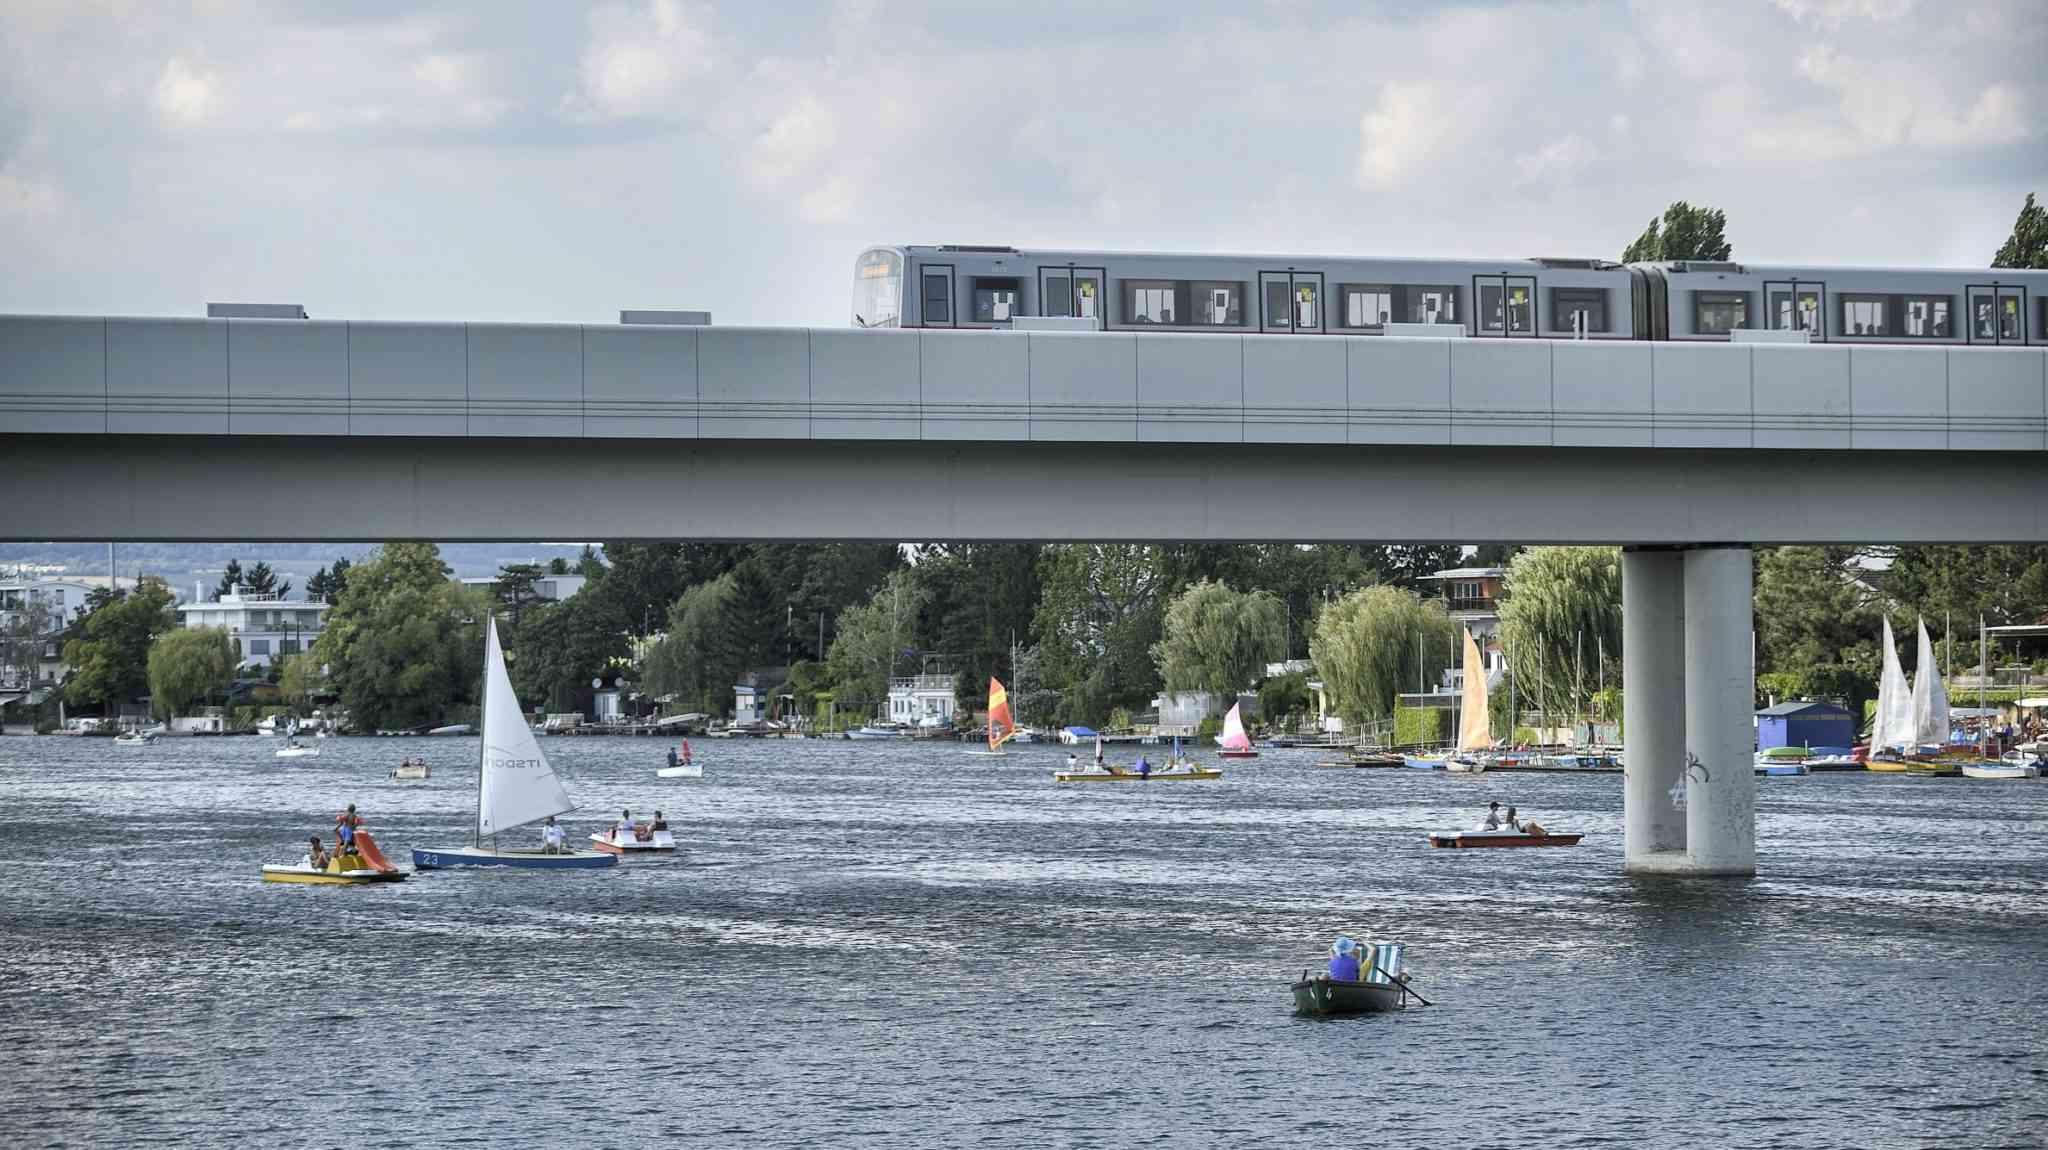 U1-Station Alte Donau